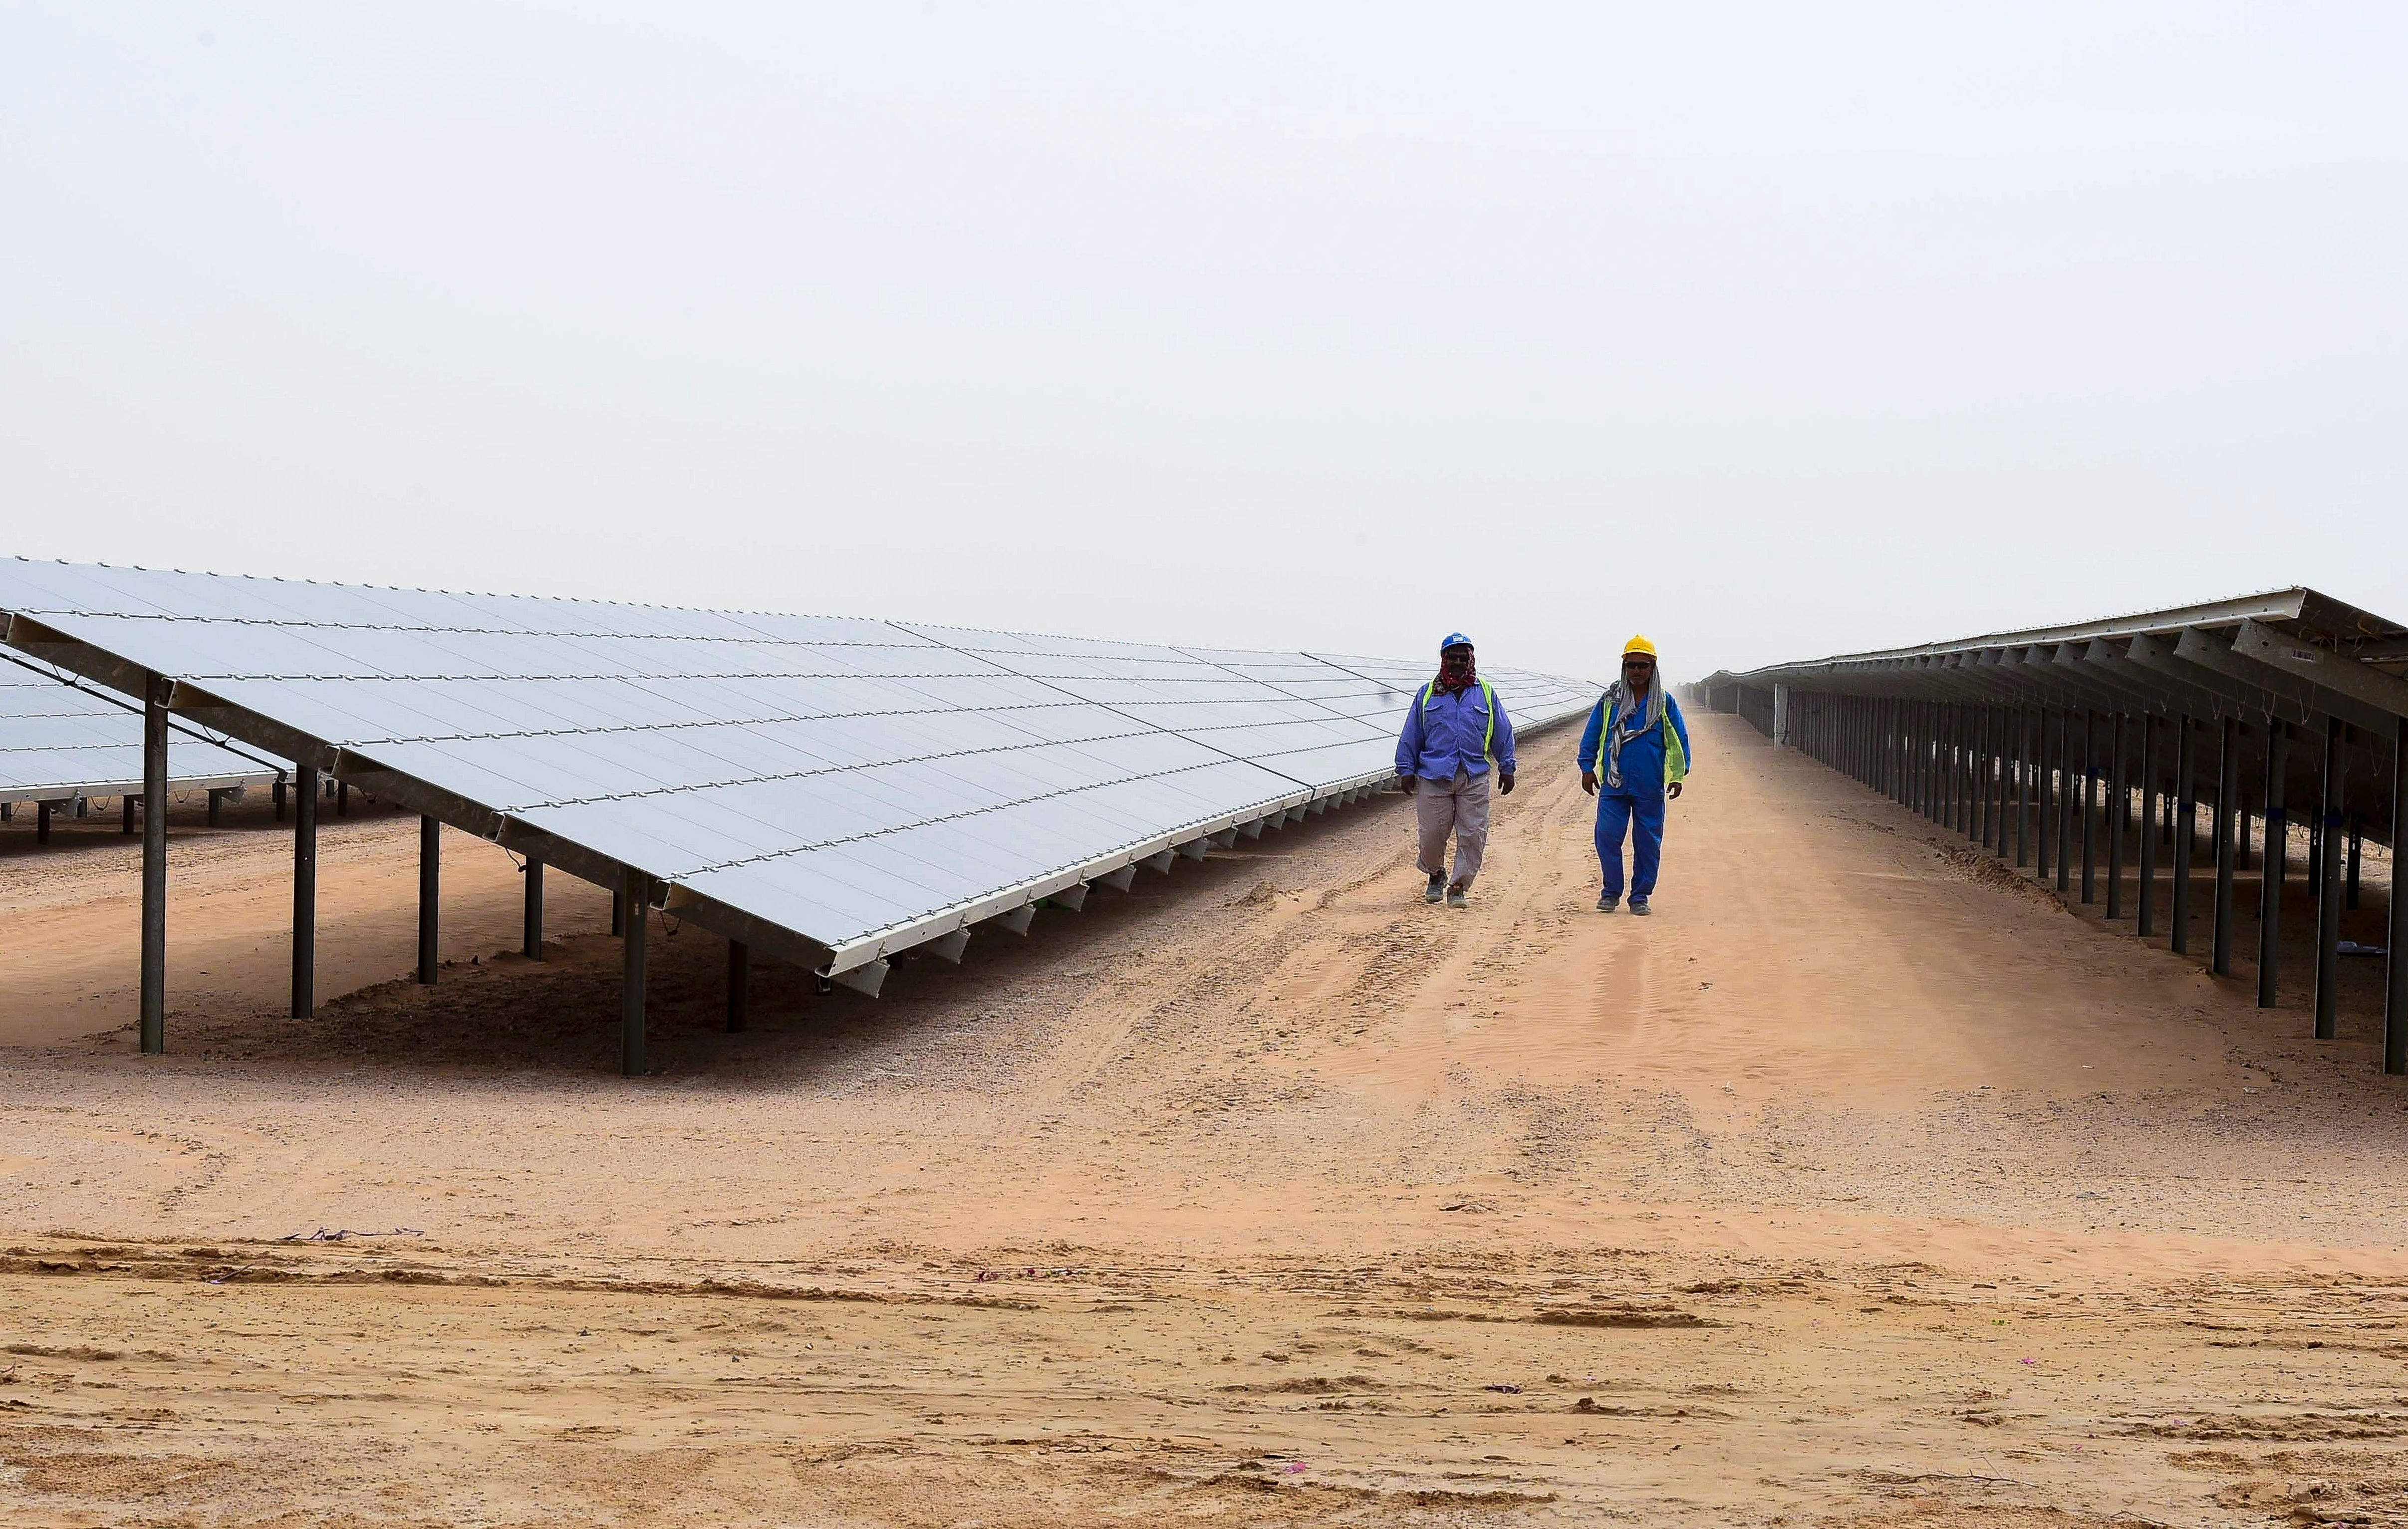 UAE-DUBAI-ELECTRICITY-ENERGY-ENVIRONMENT